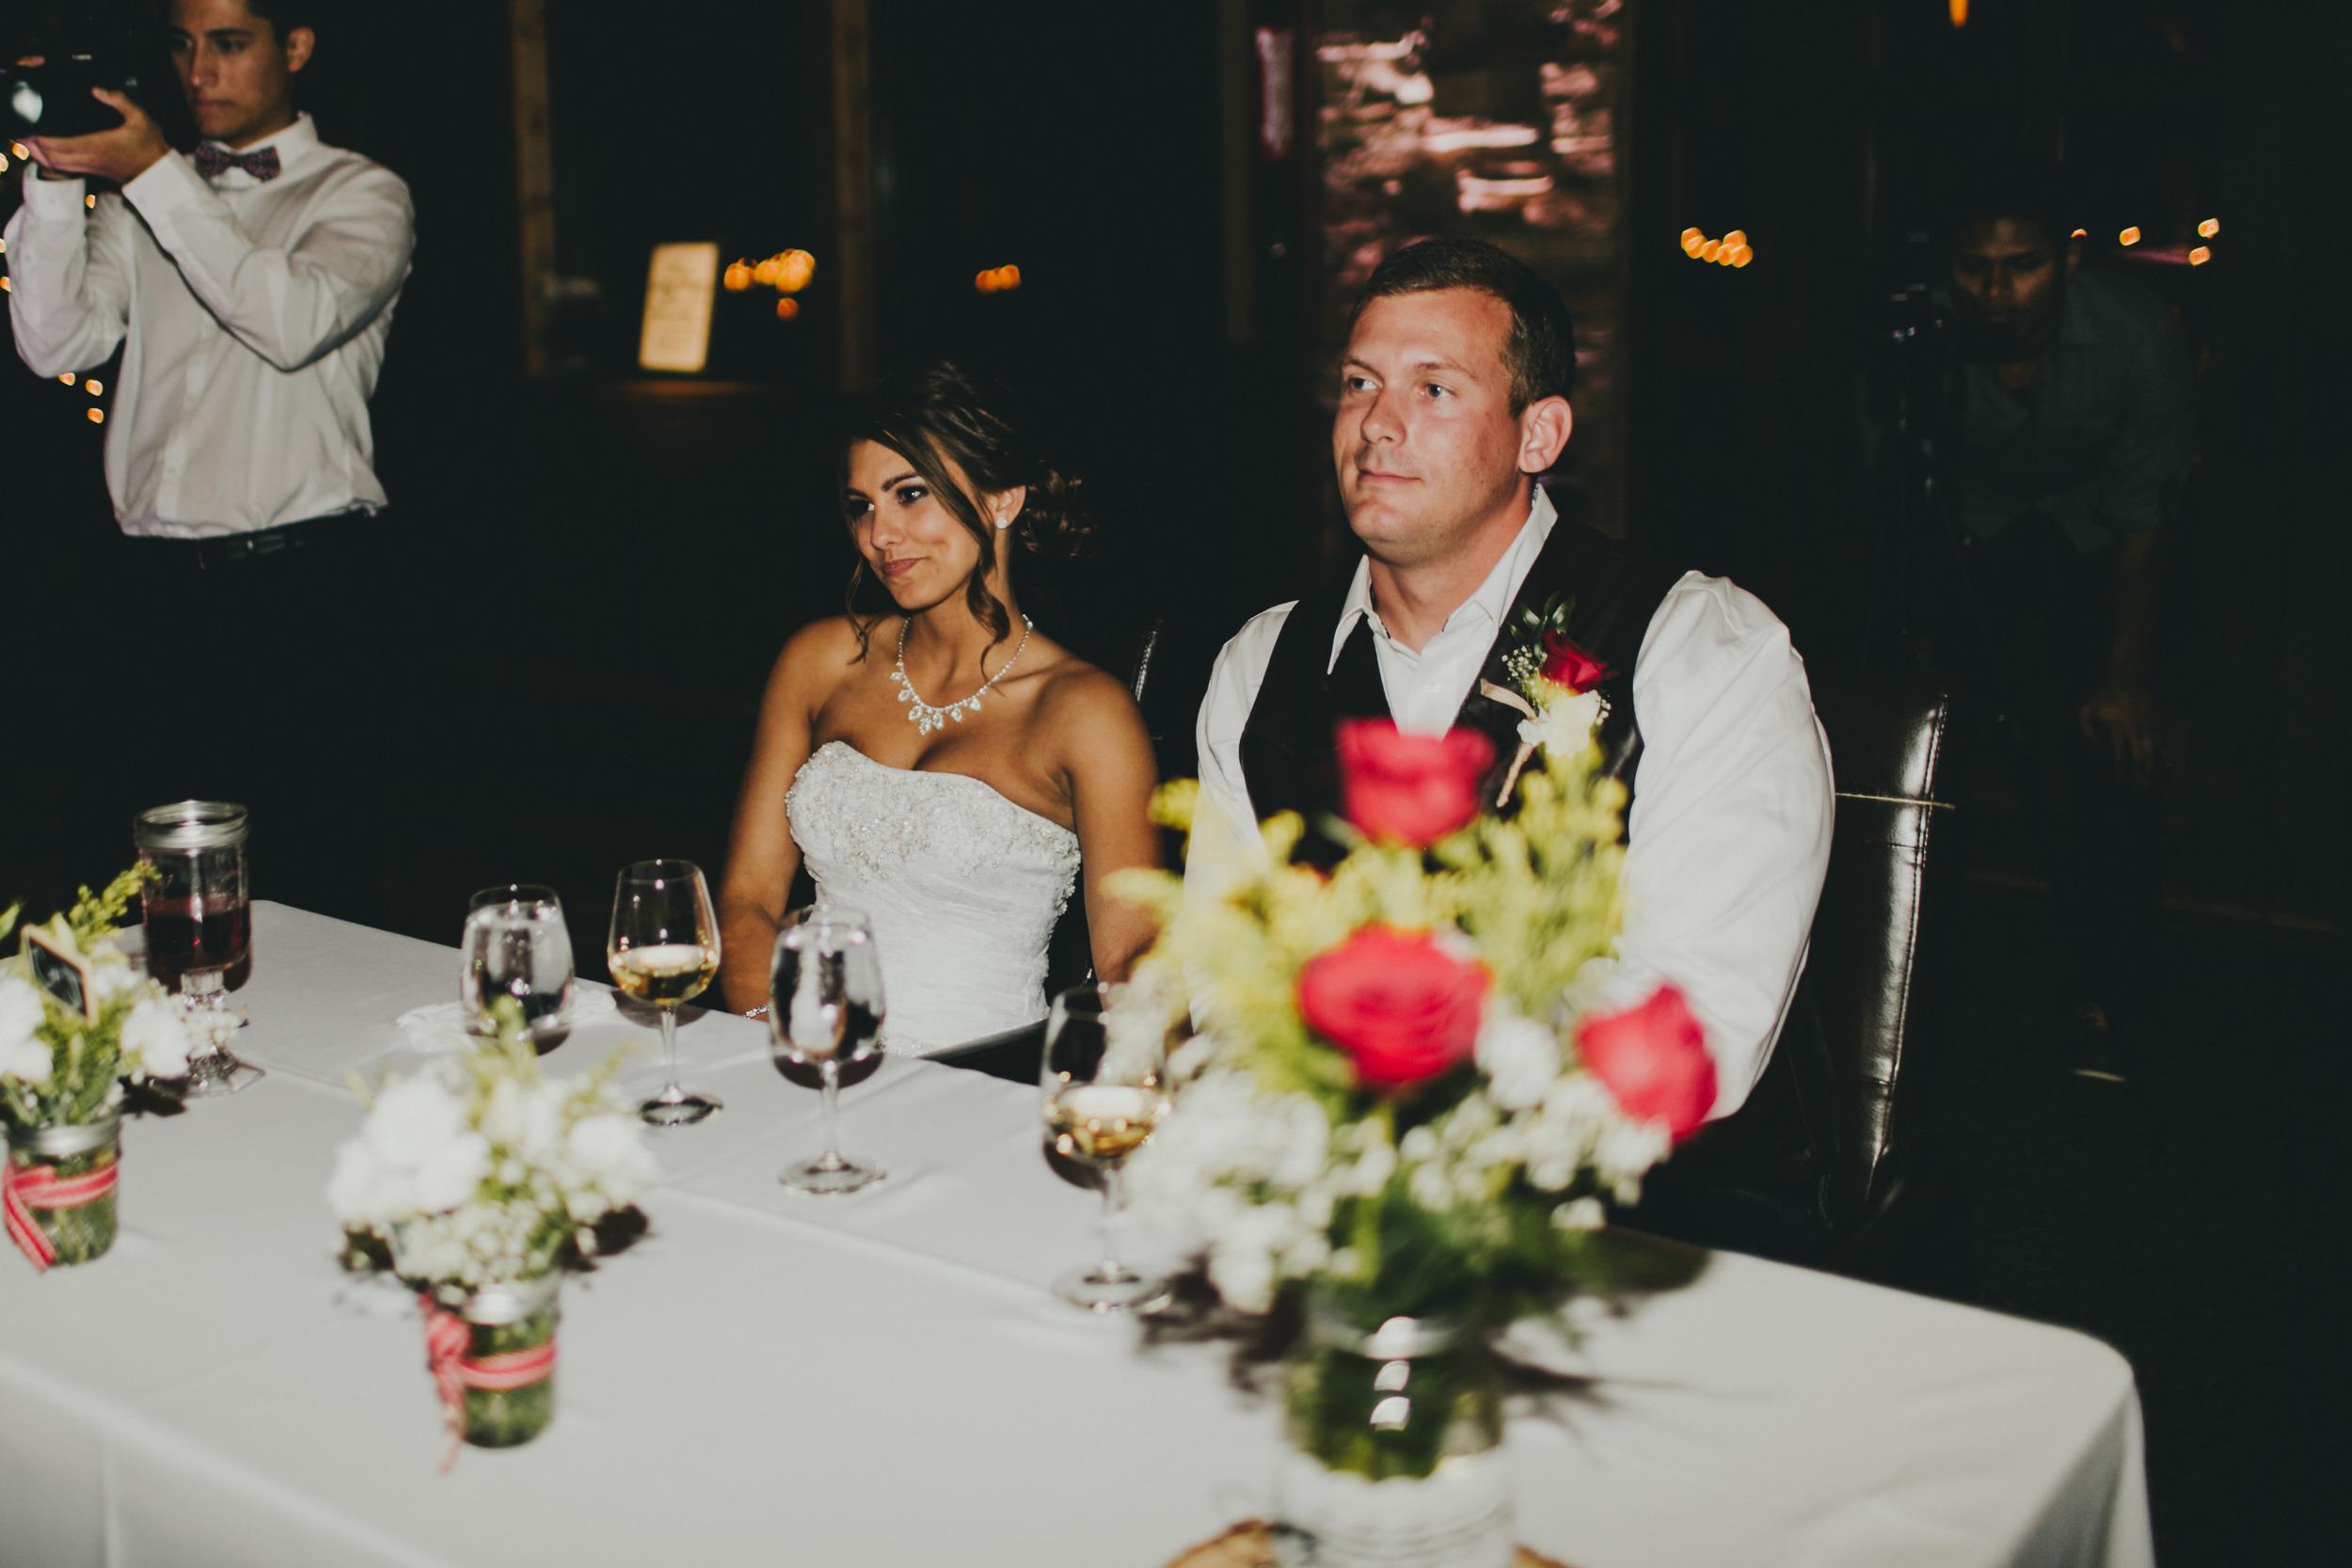 Cheyenne + Jordan - Wedding, Natalie Griffo (114 of 157).jpg